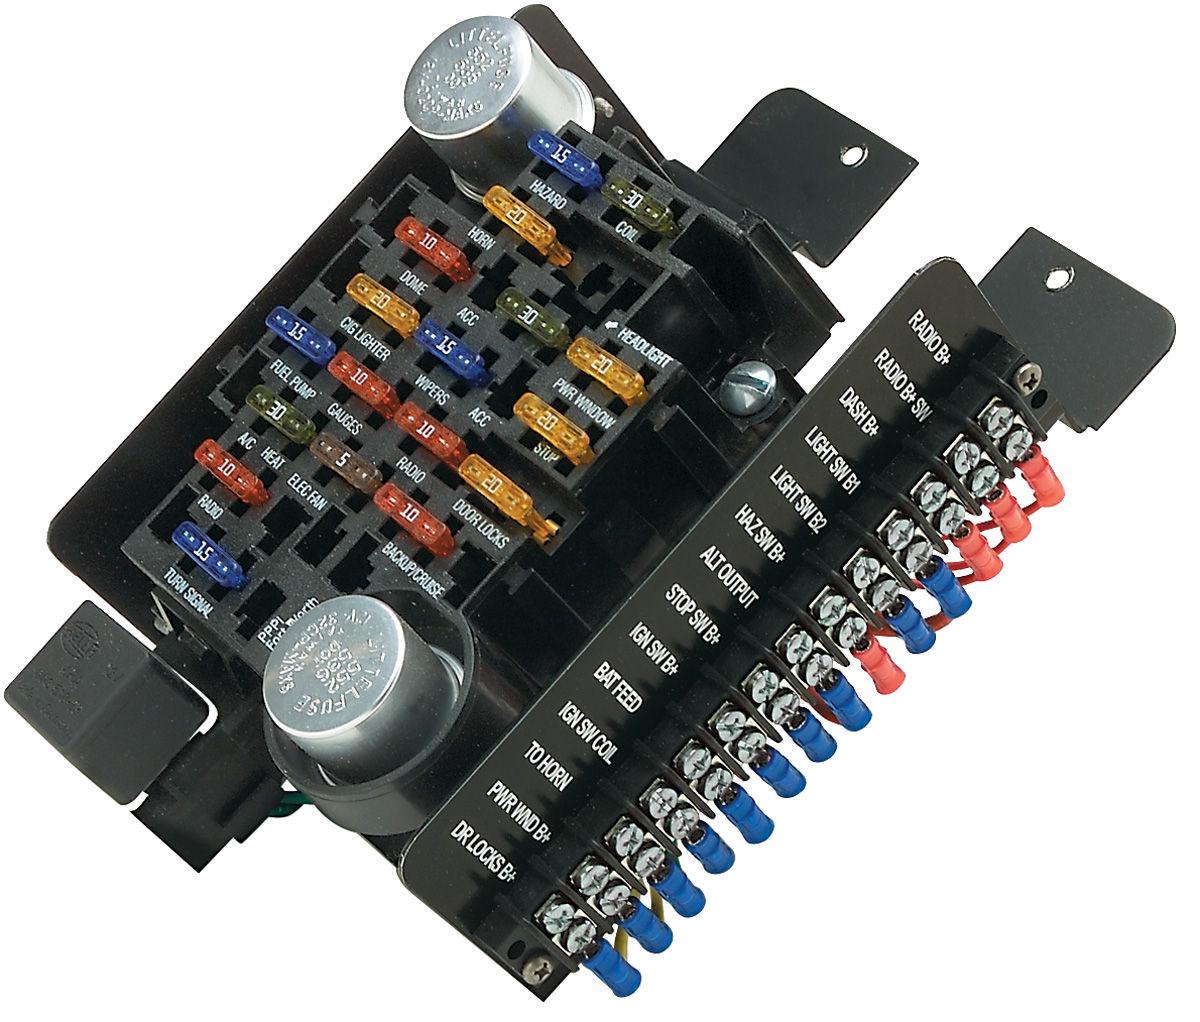 small resolution of fuse box 1985 el camino ss choo choo custom simple wiring diagram rh 58 lodge finder de 79 cutlass 85 cutlass fuse box